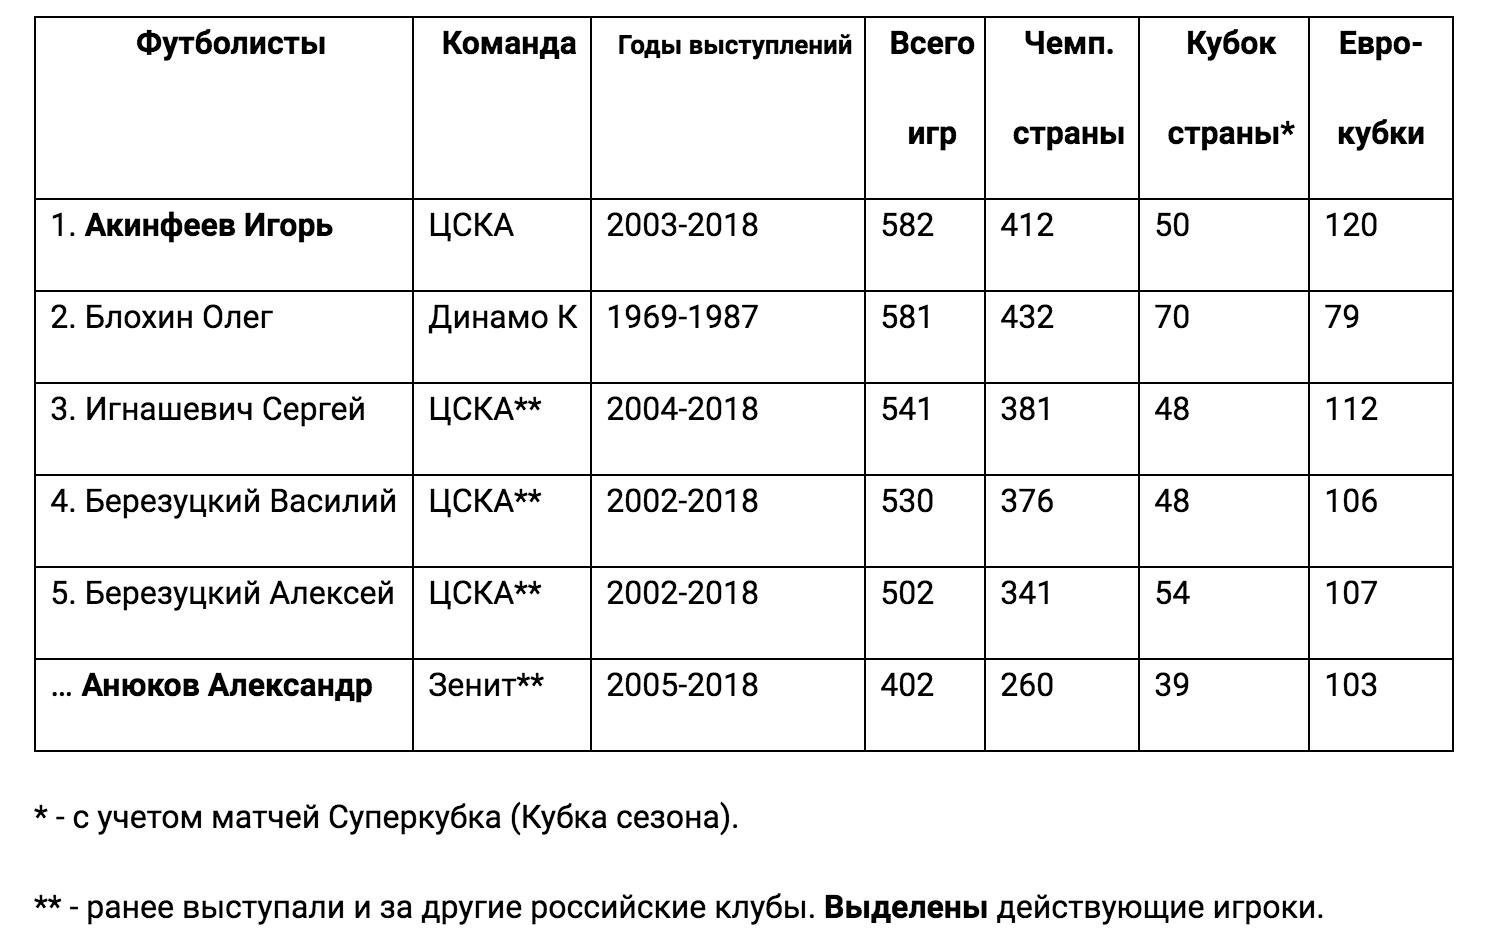 rue265ae59764 - Акинфеев побил рекорд Блохина по числу матчей за один клуб